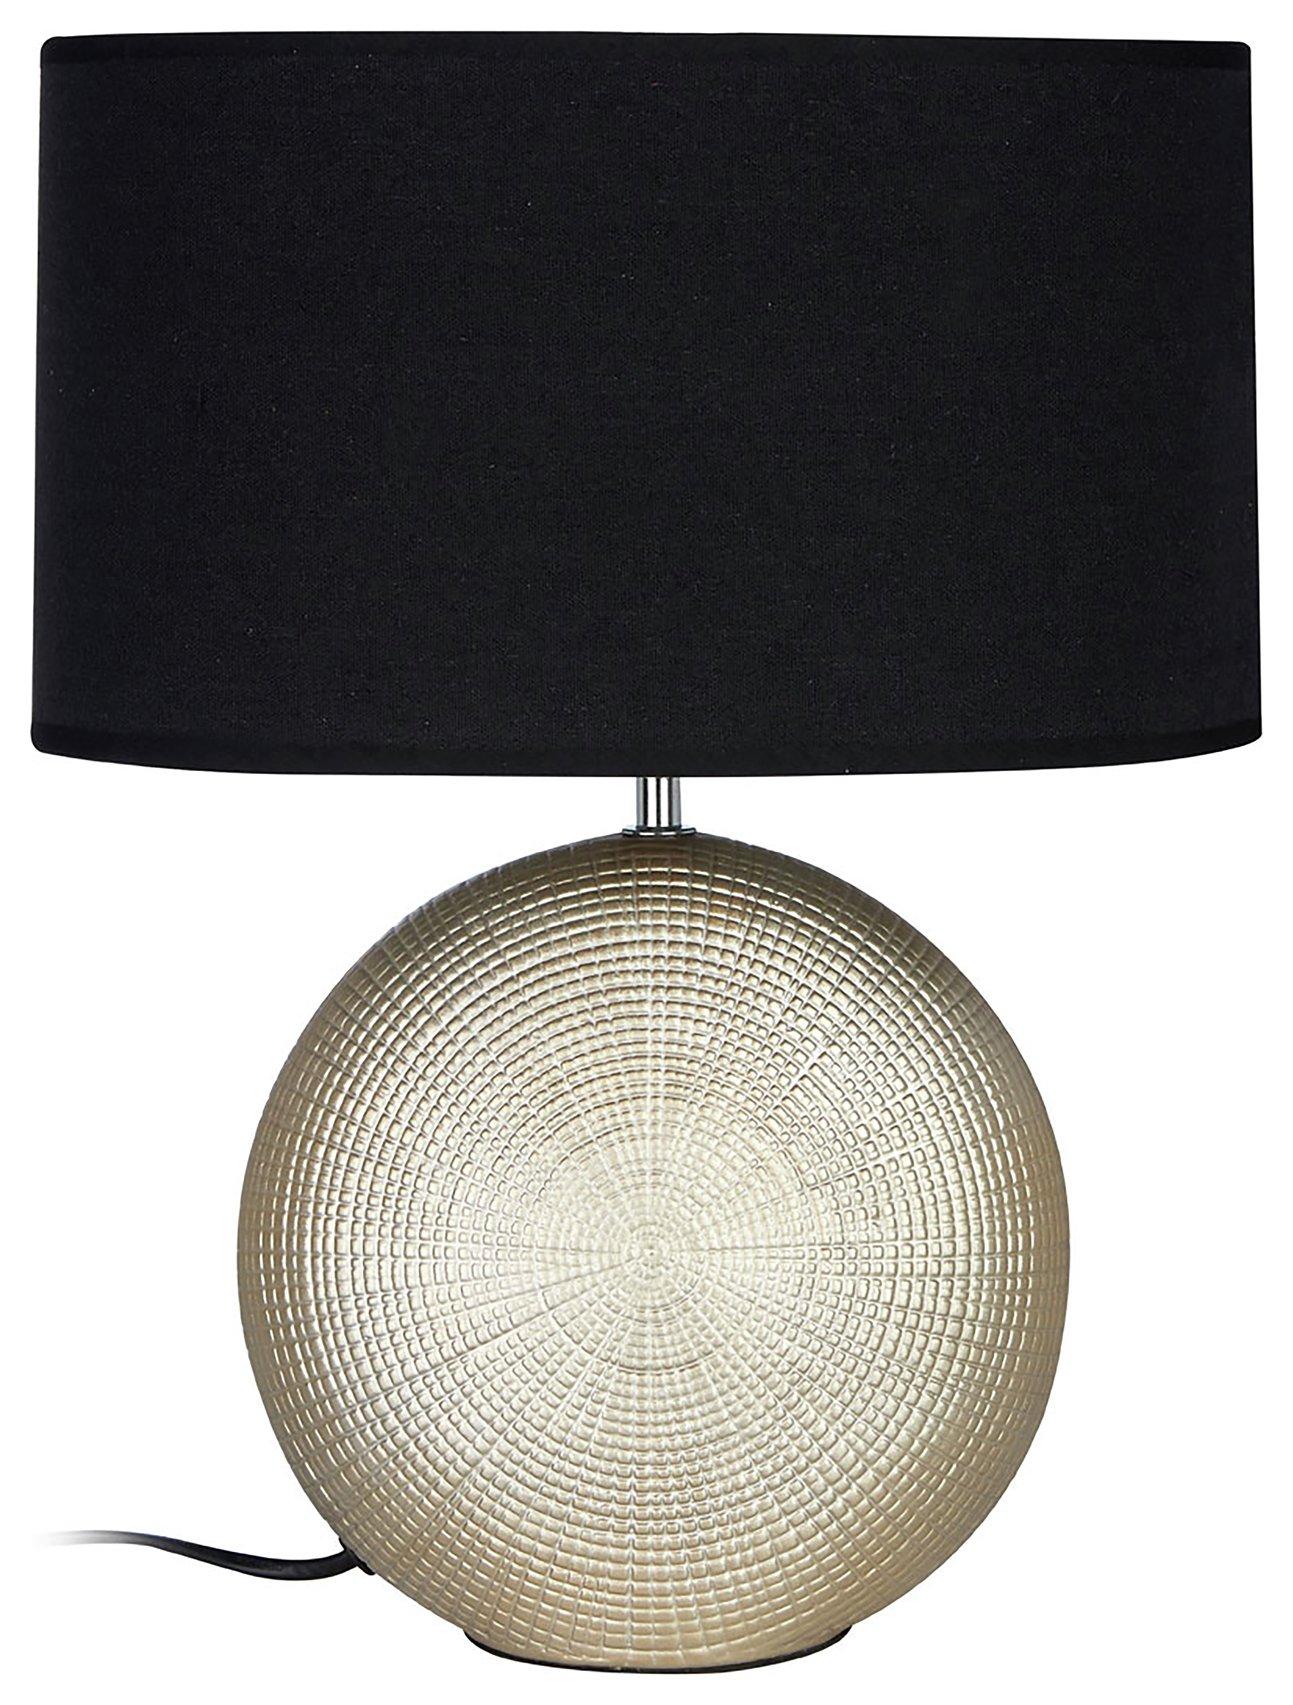 Image of Whisper - Ceramic - Table Lamp - Black & Gold